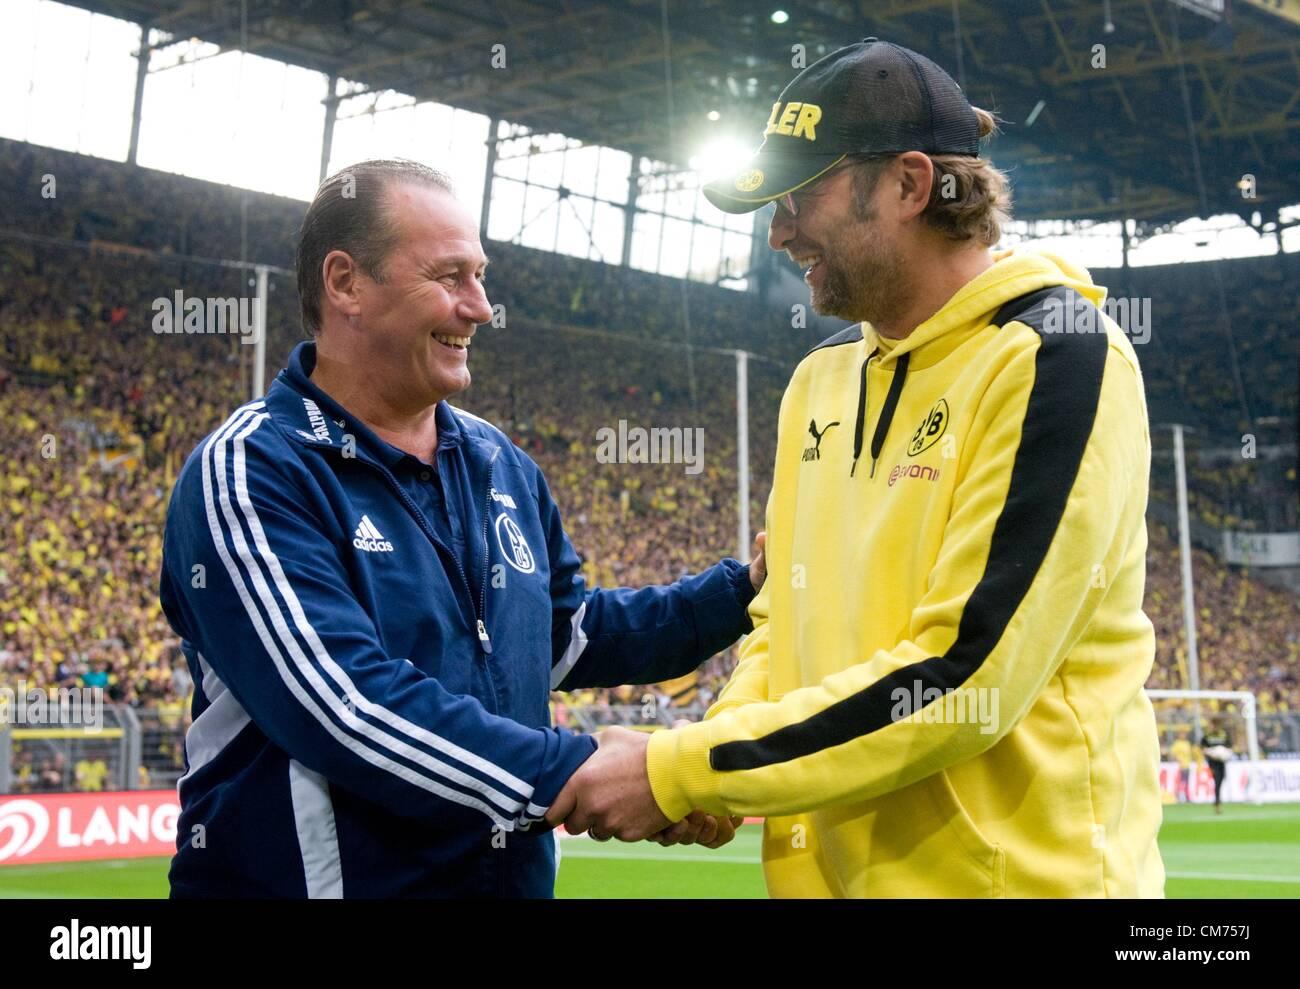 Dortmund, Germany. 20th October 2012.  Dortmund's head coach Juergen Klopp (R) shakes hands with Schalke head - Stock Image